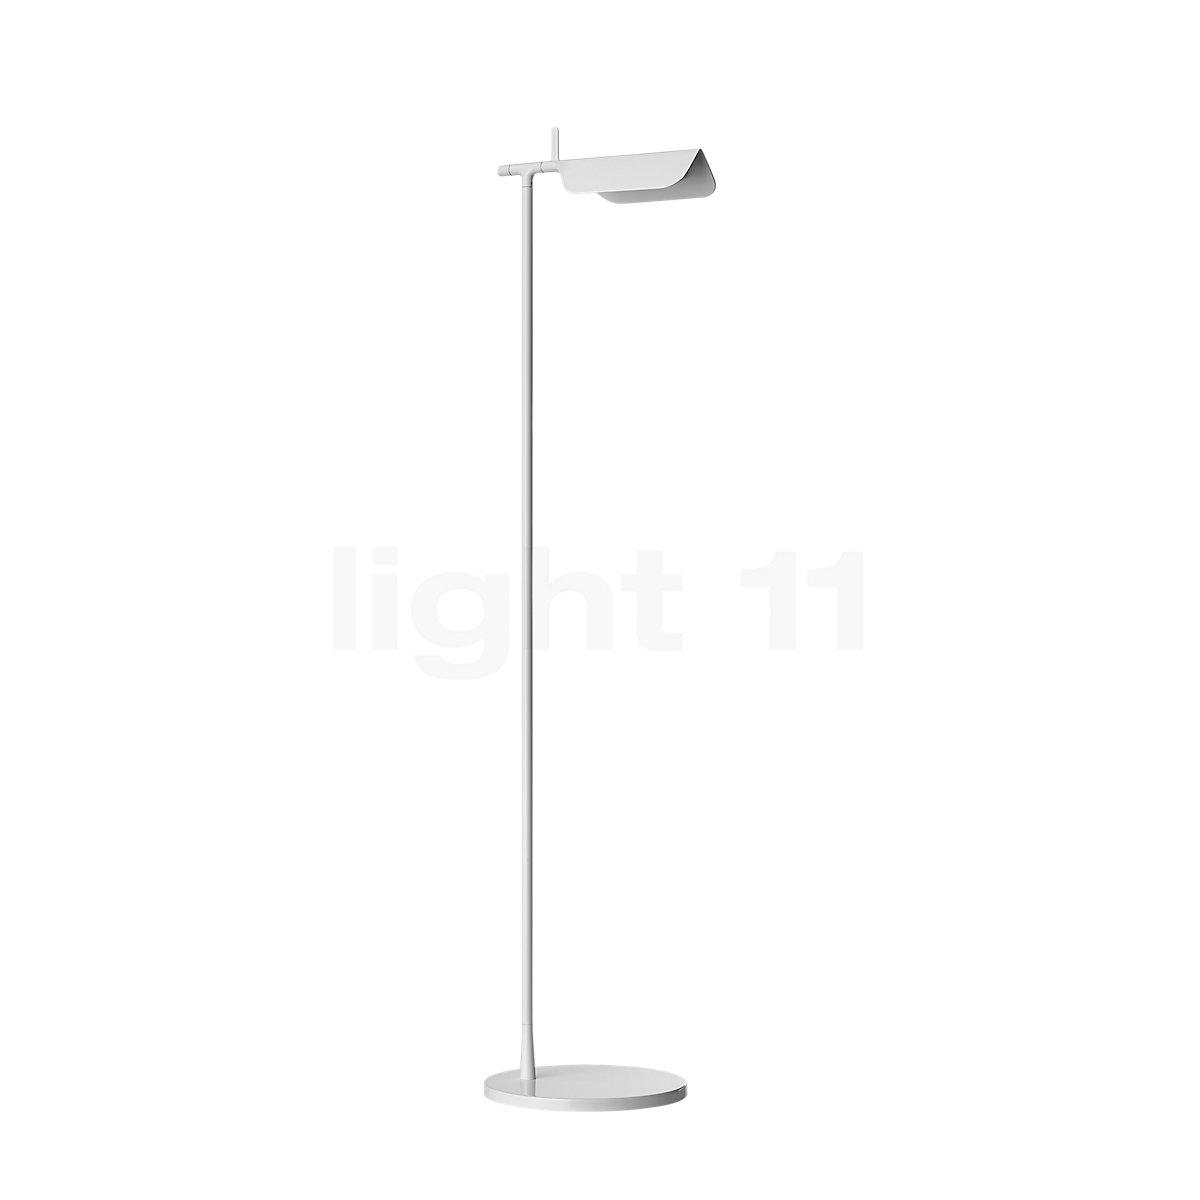 Buy Flos Tab F Led At Light11 Eu